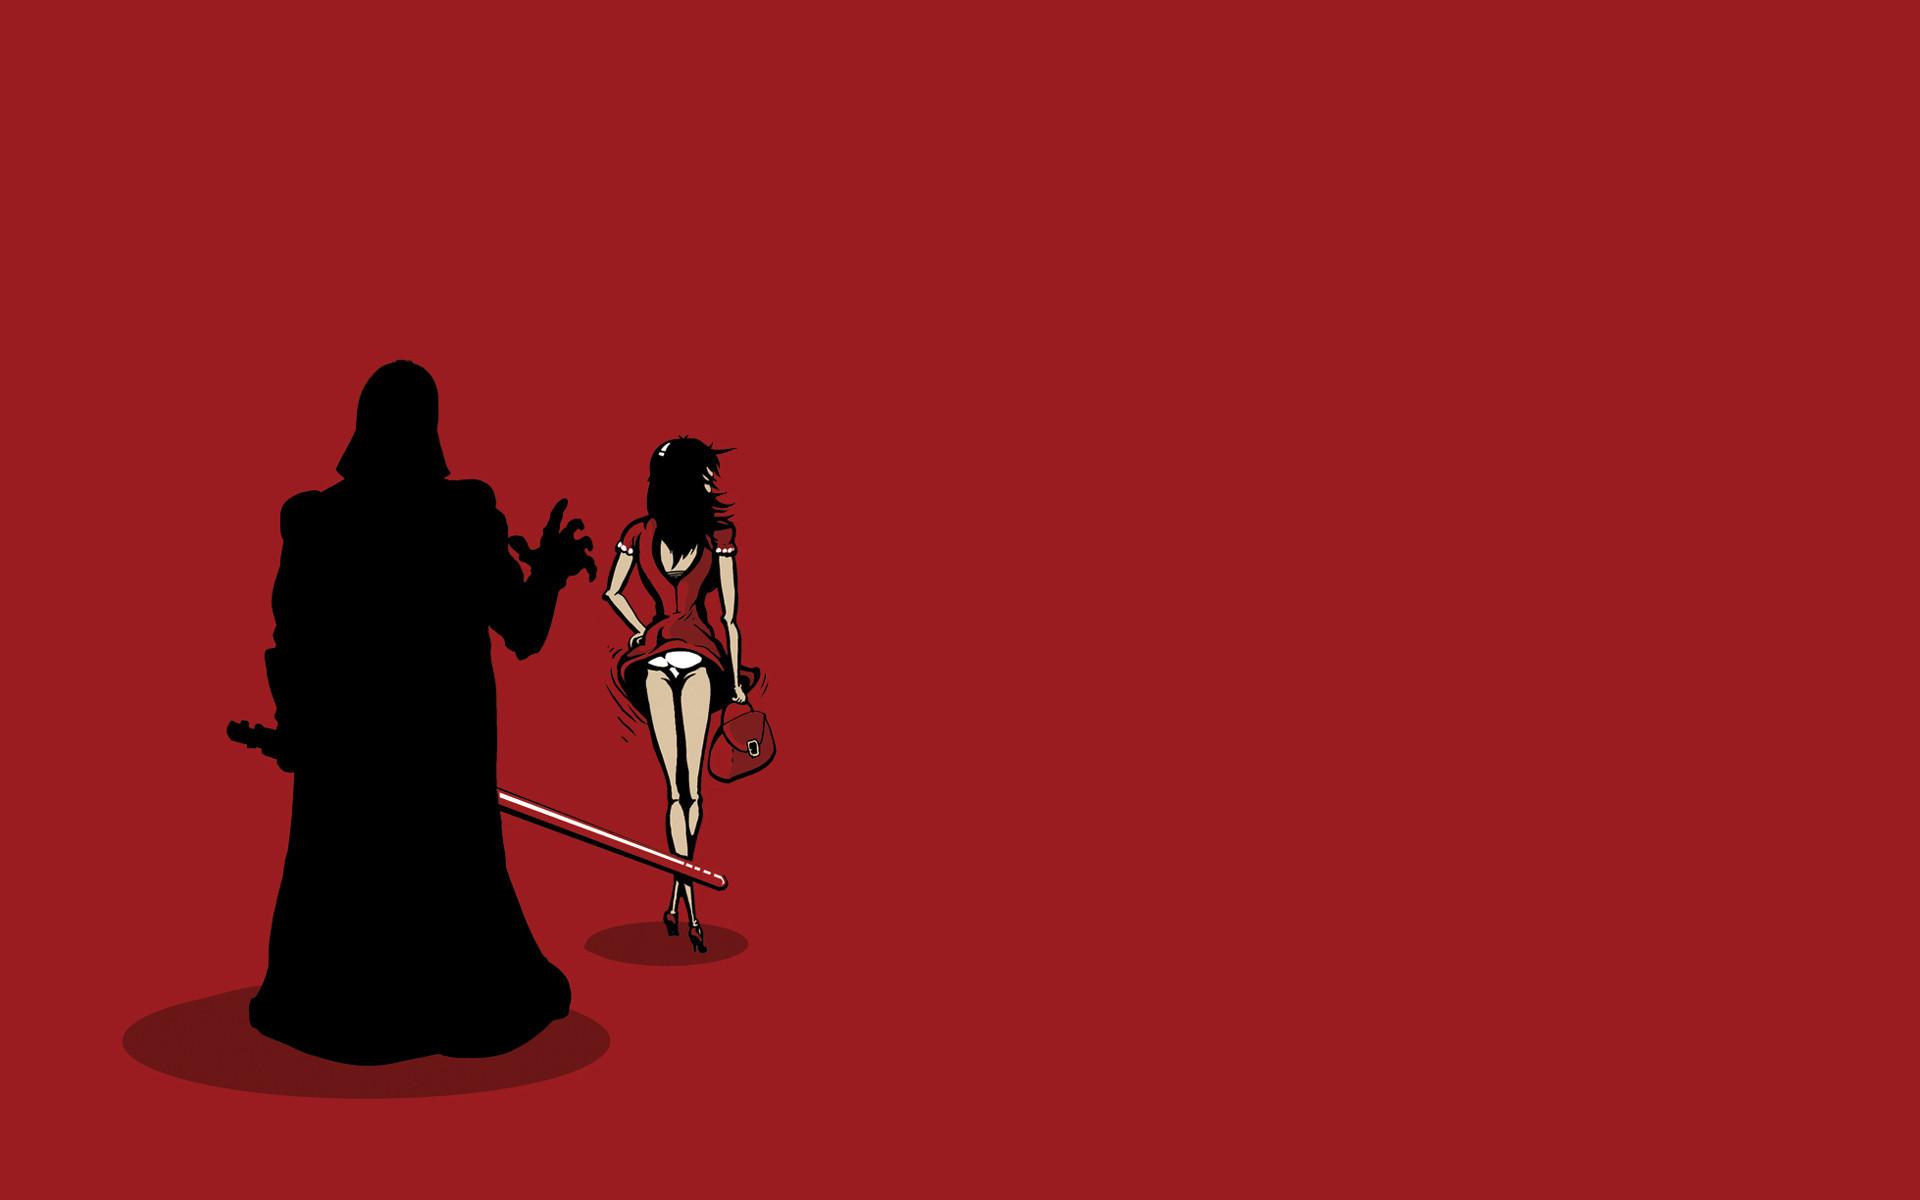 darth-vader-dress-red-star-wars.jpg